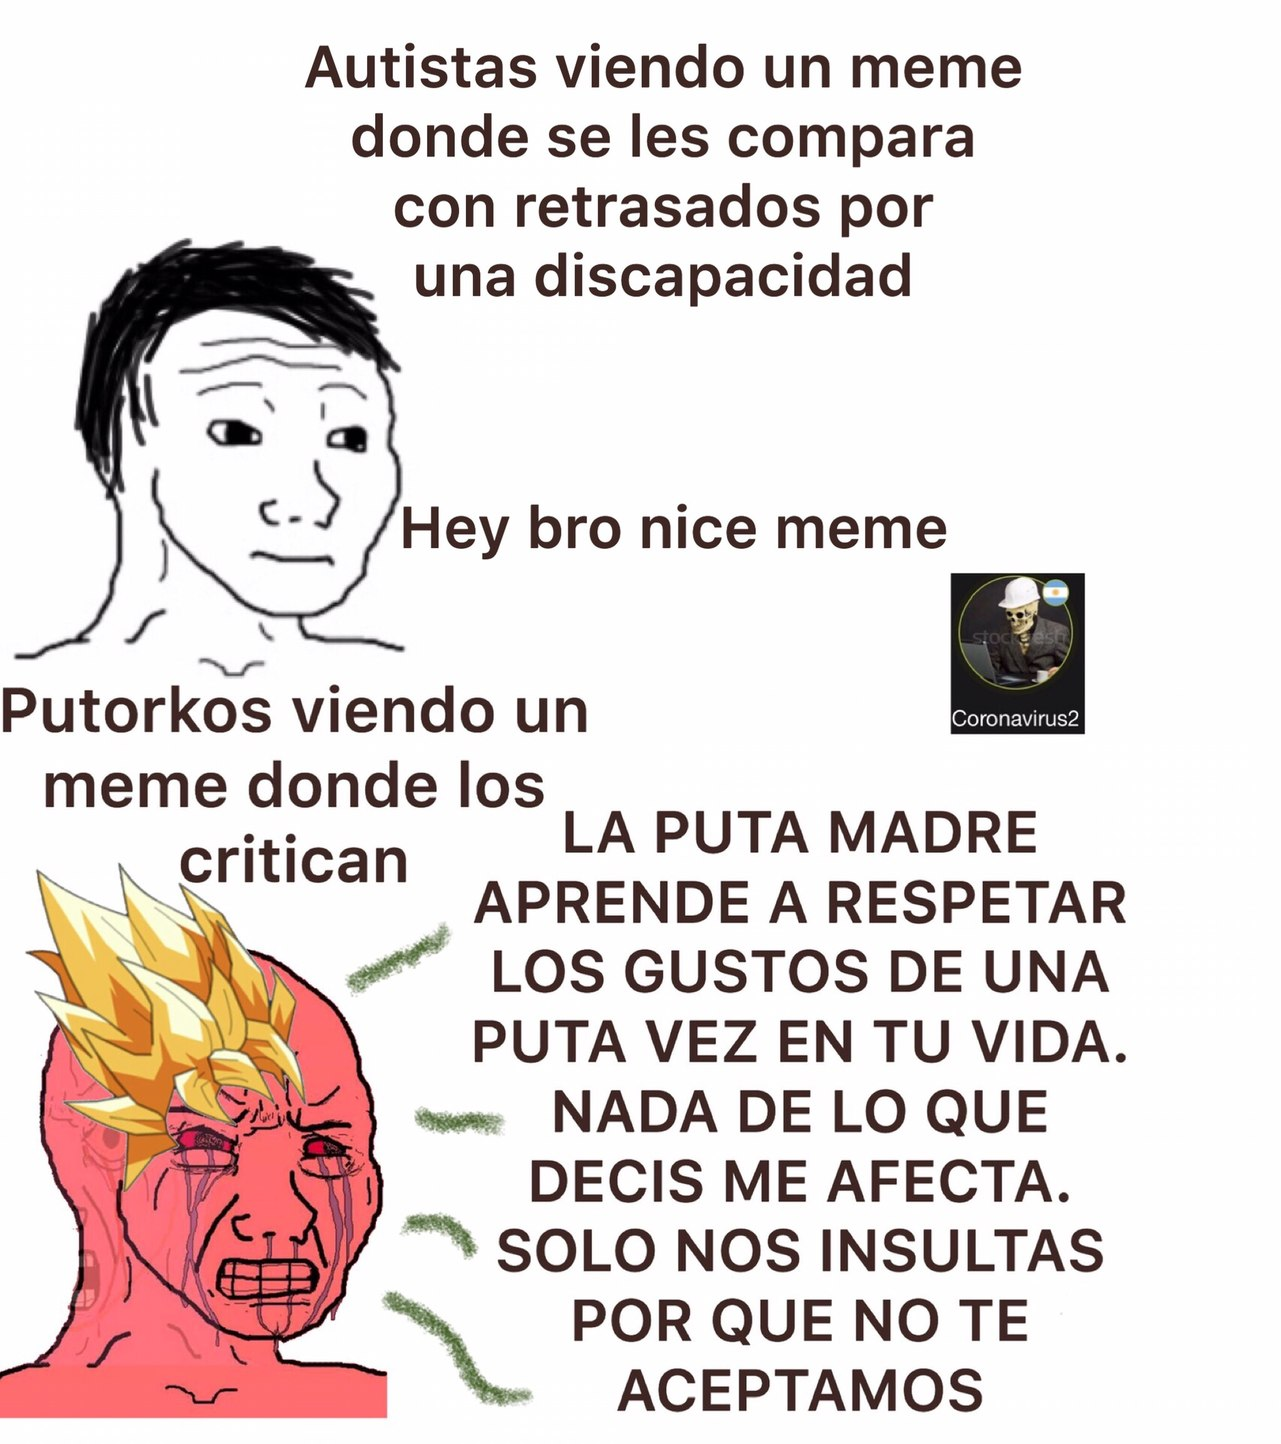 hey bro nice meme